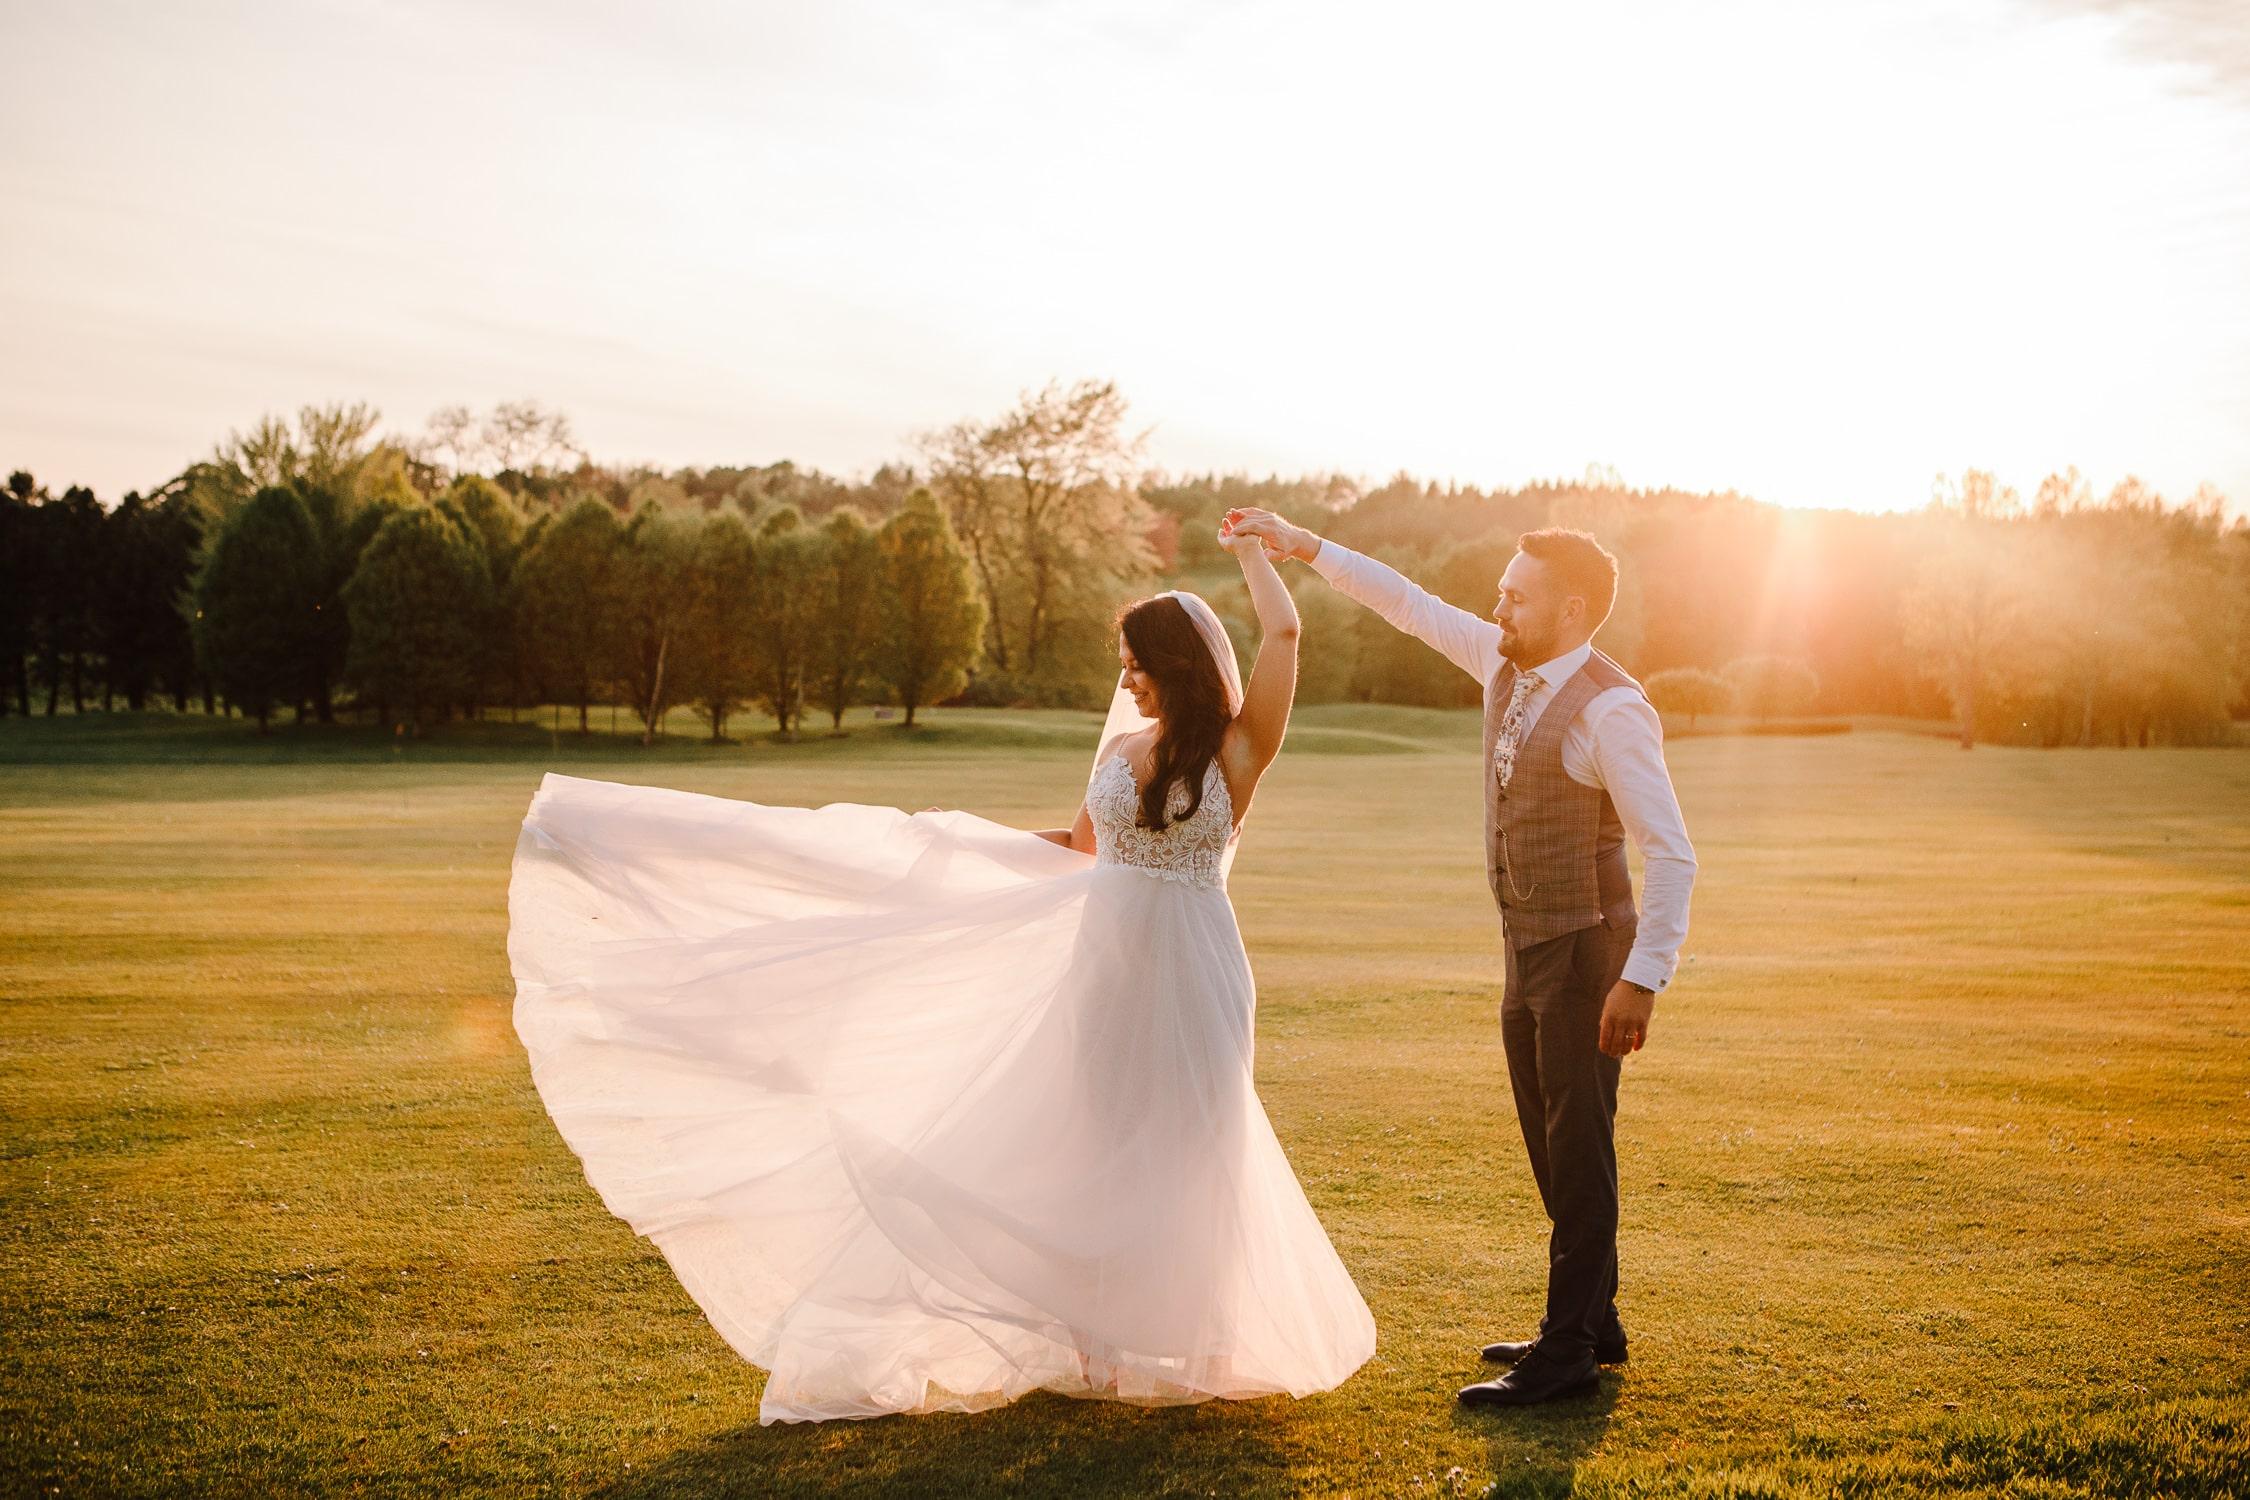 ivy_white_wedding_dress